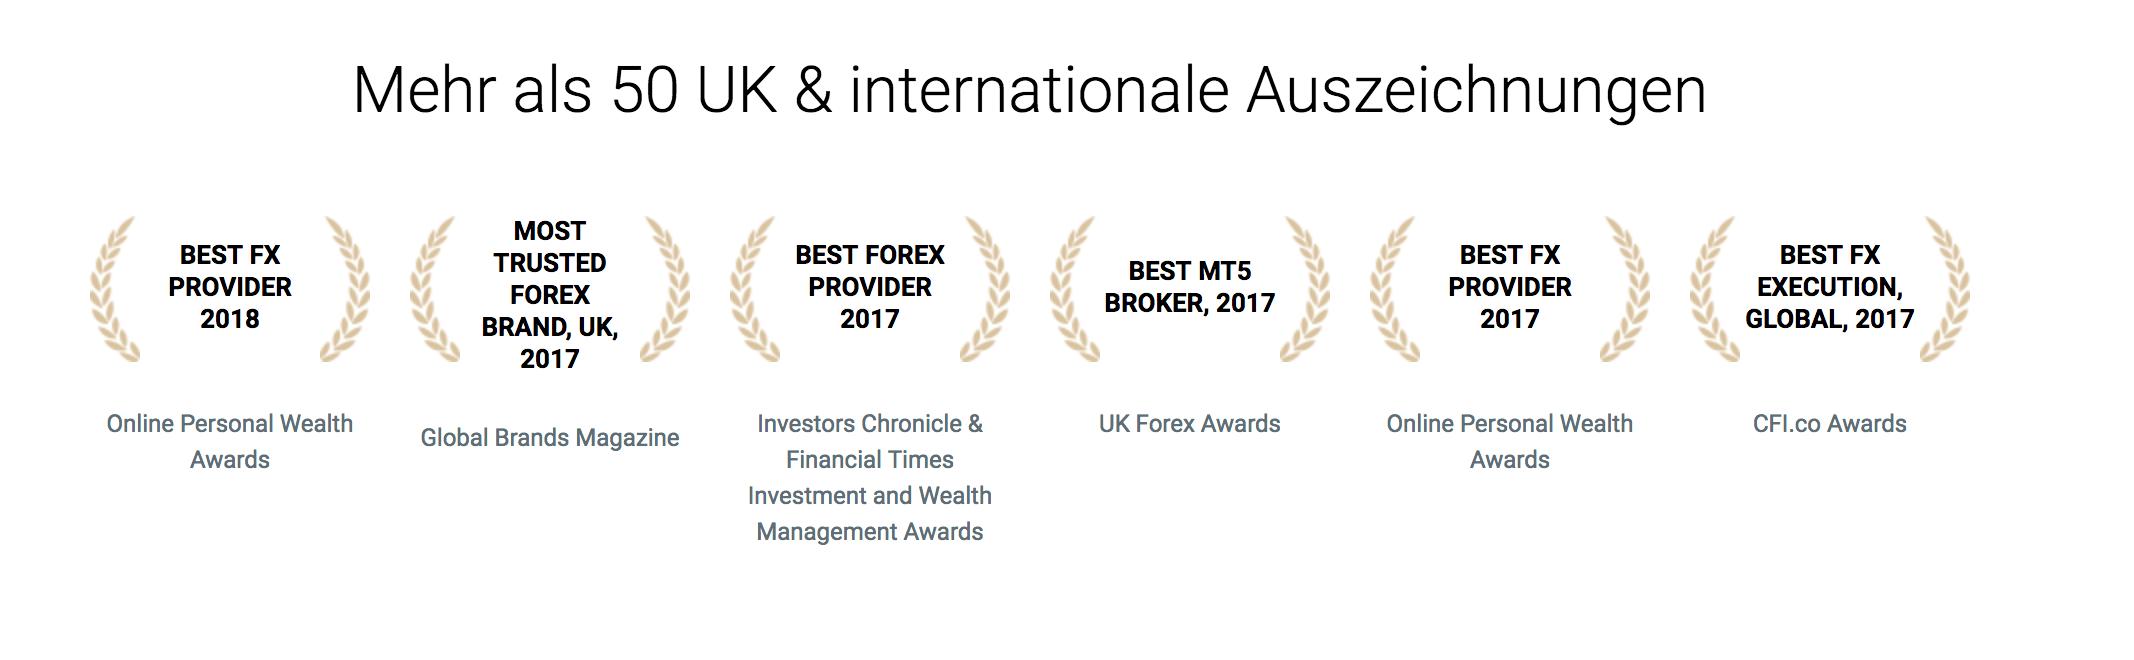 FxPro erhielt mehrere internationale Awards